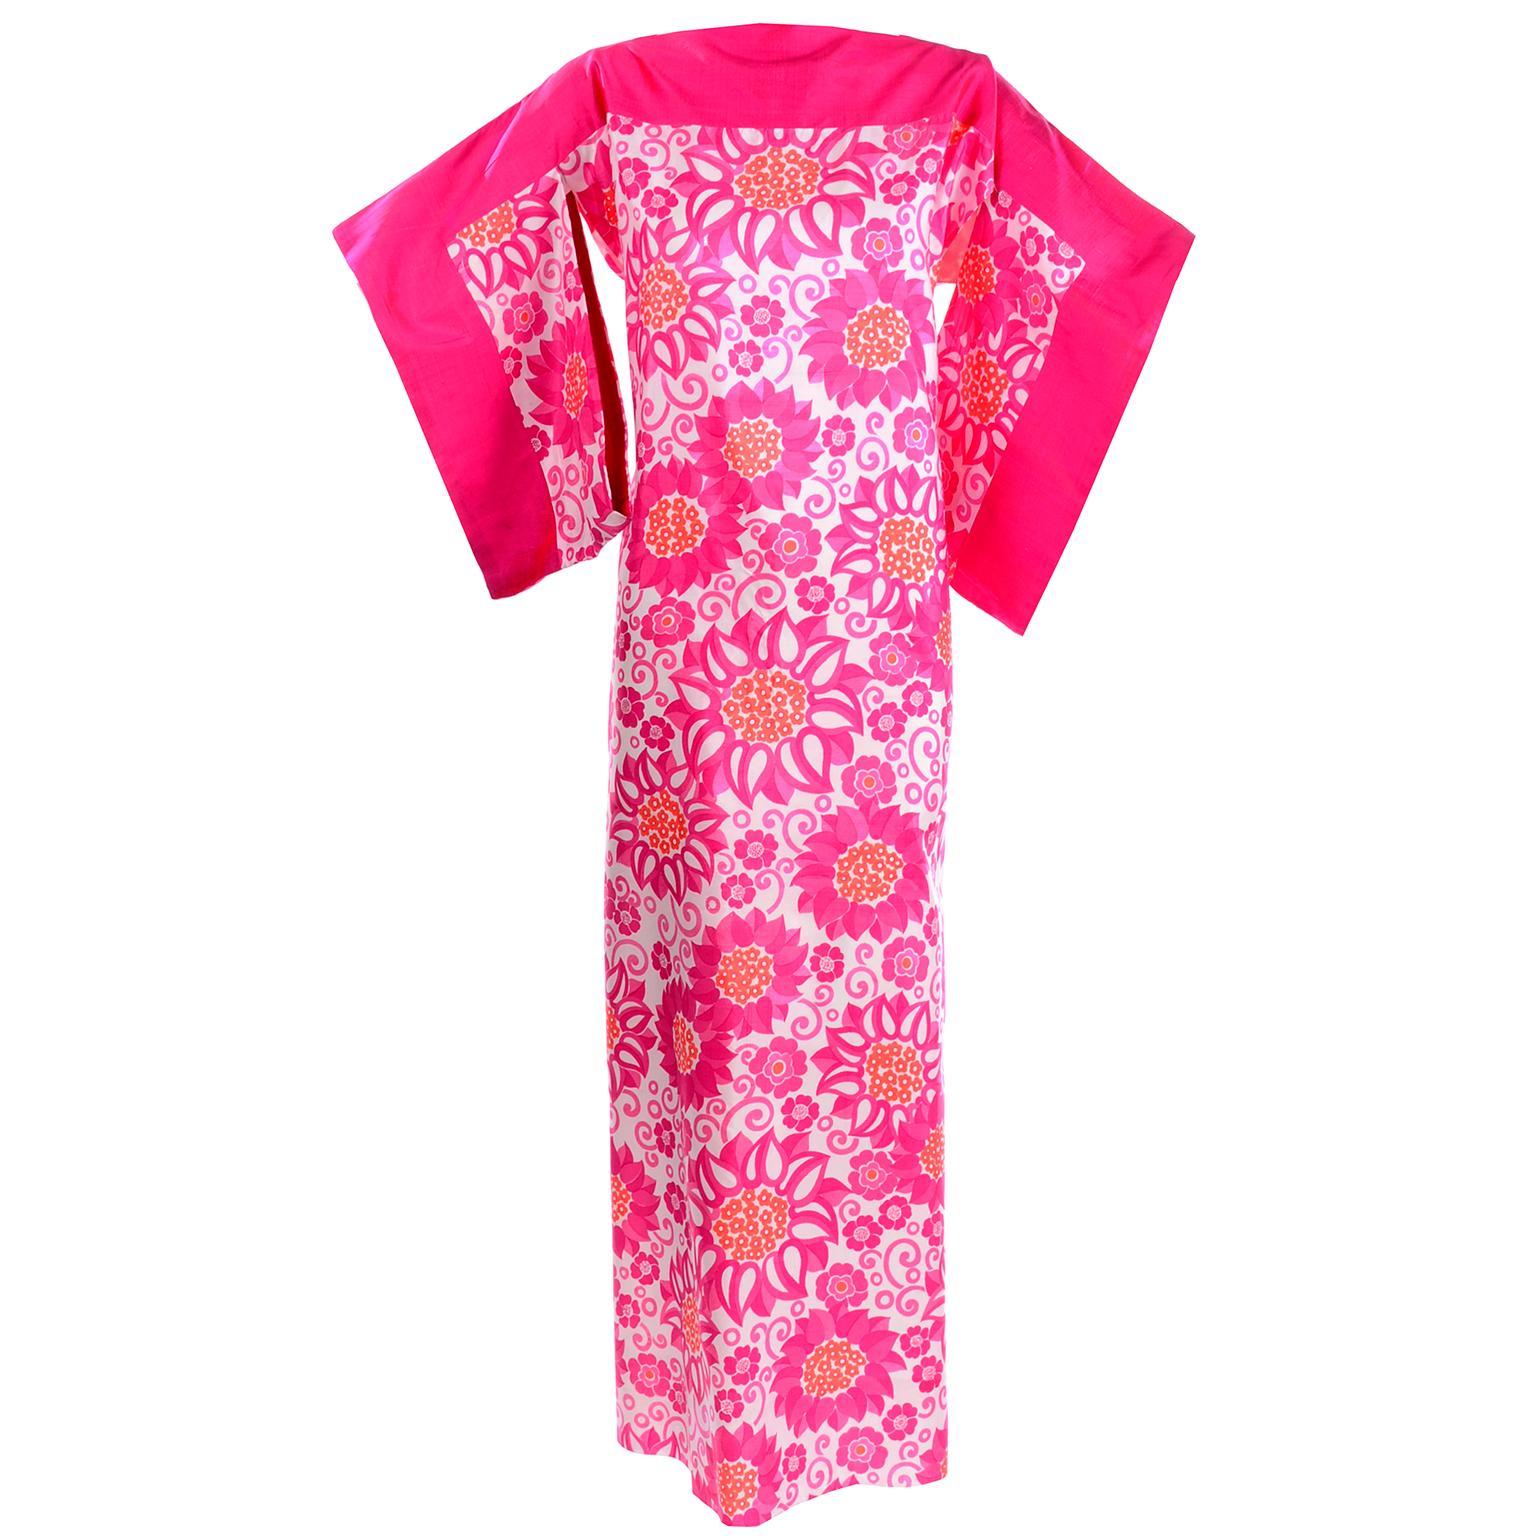 b3a93a90b1d Mod Dresses - 251 For Sale on 1stdibs